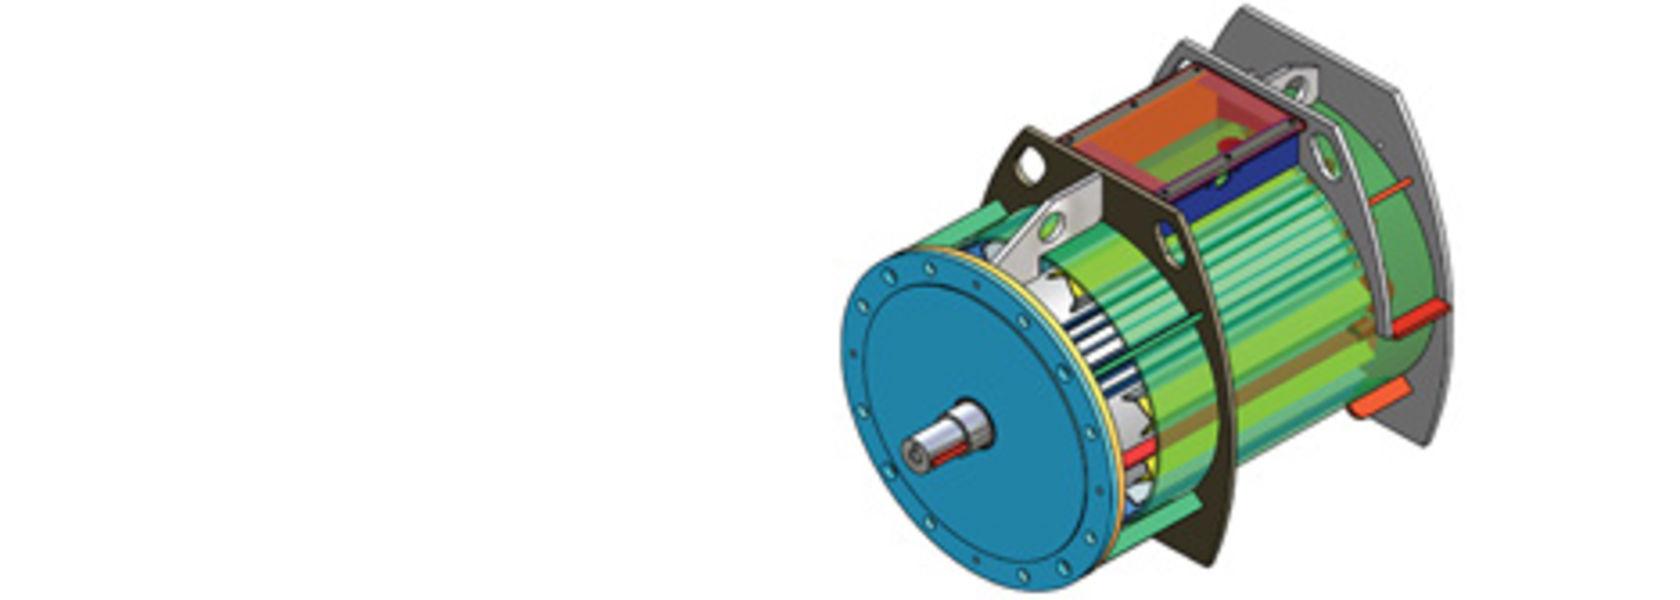 M&C launches scraper winch motor - Mining Magazine